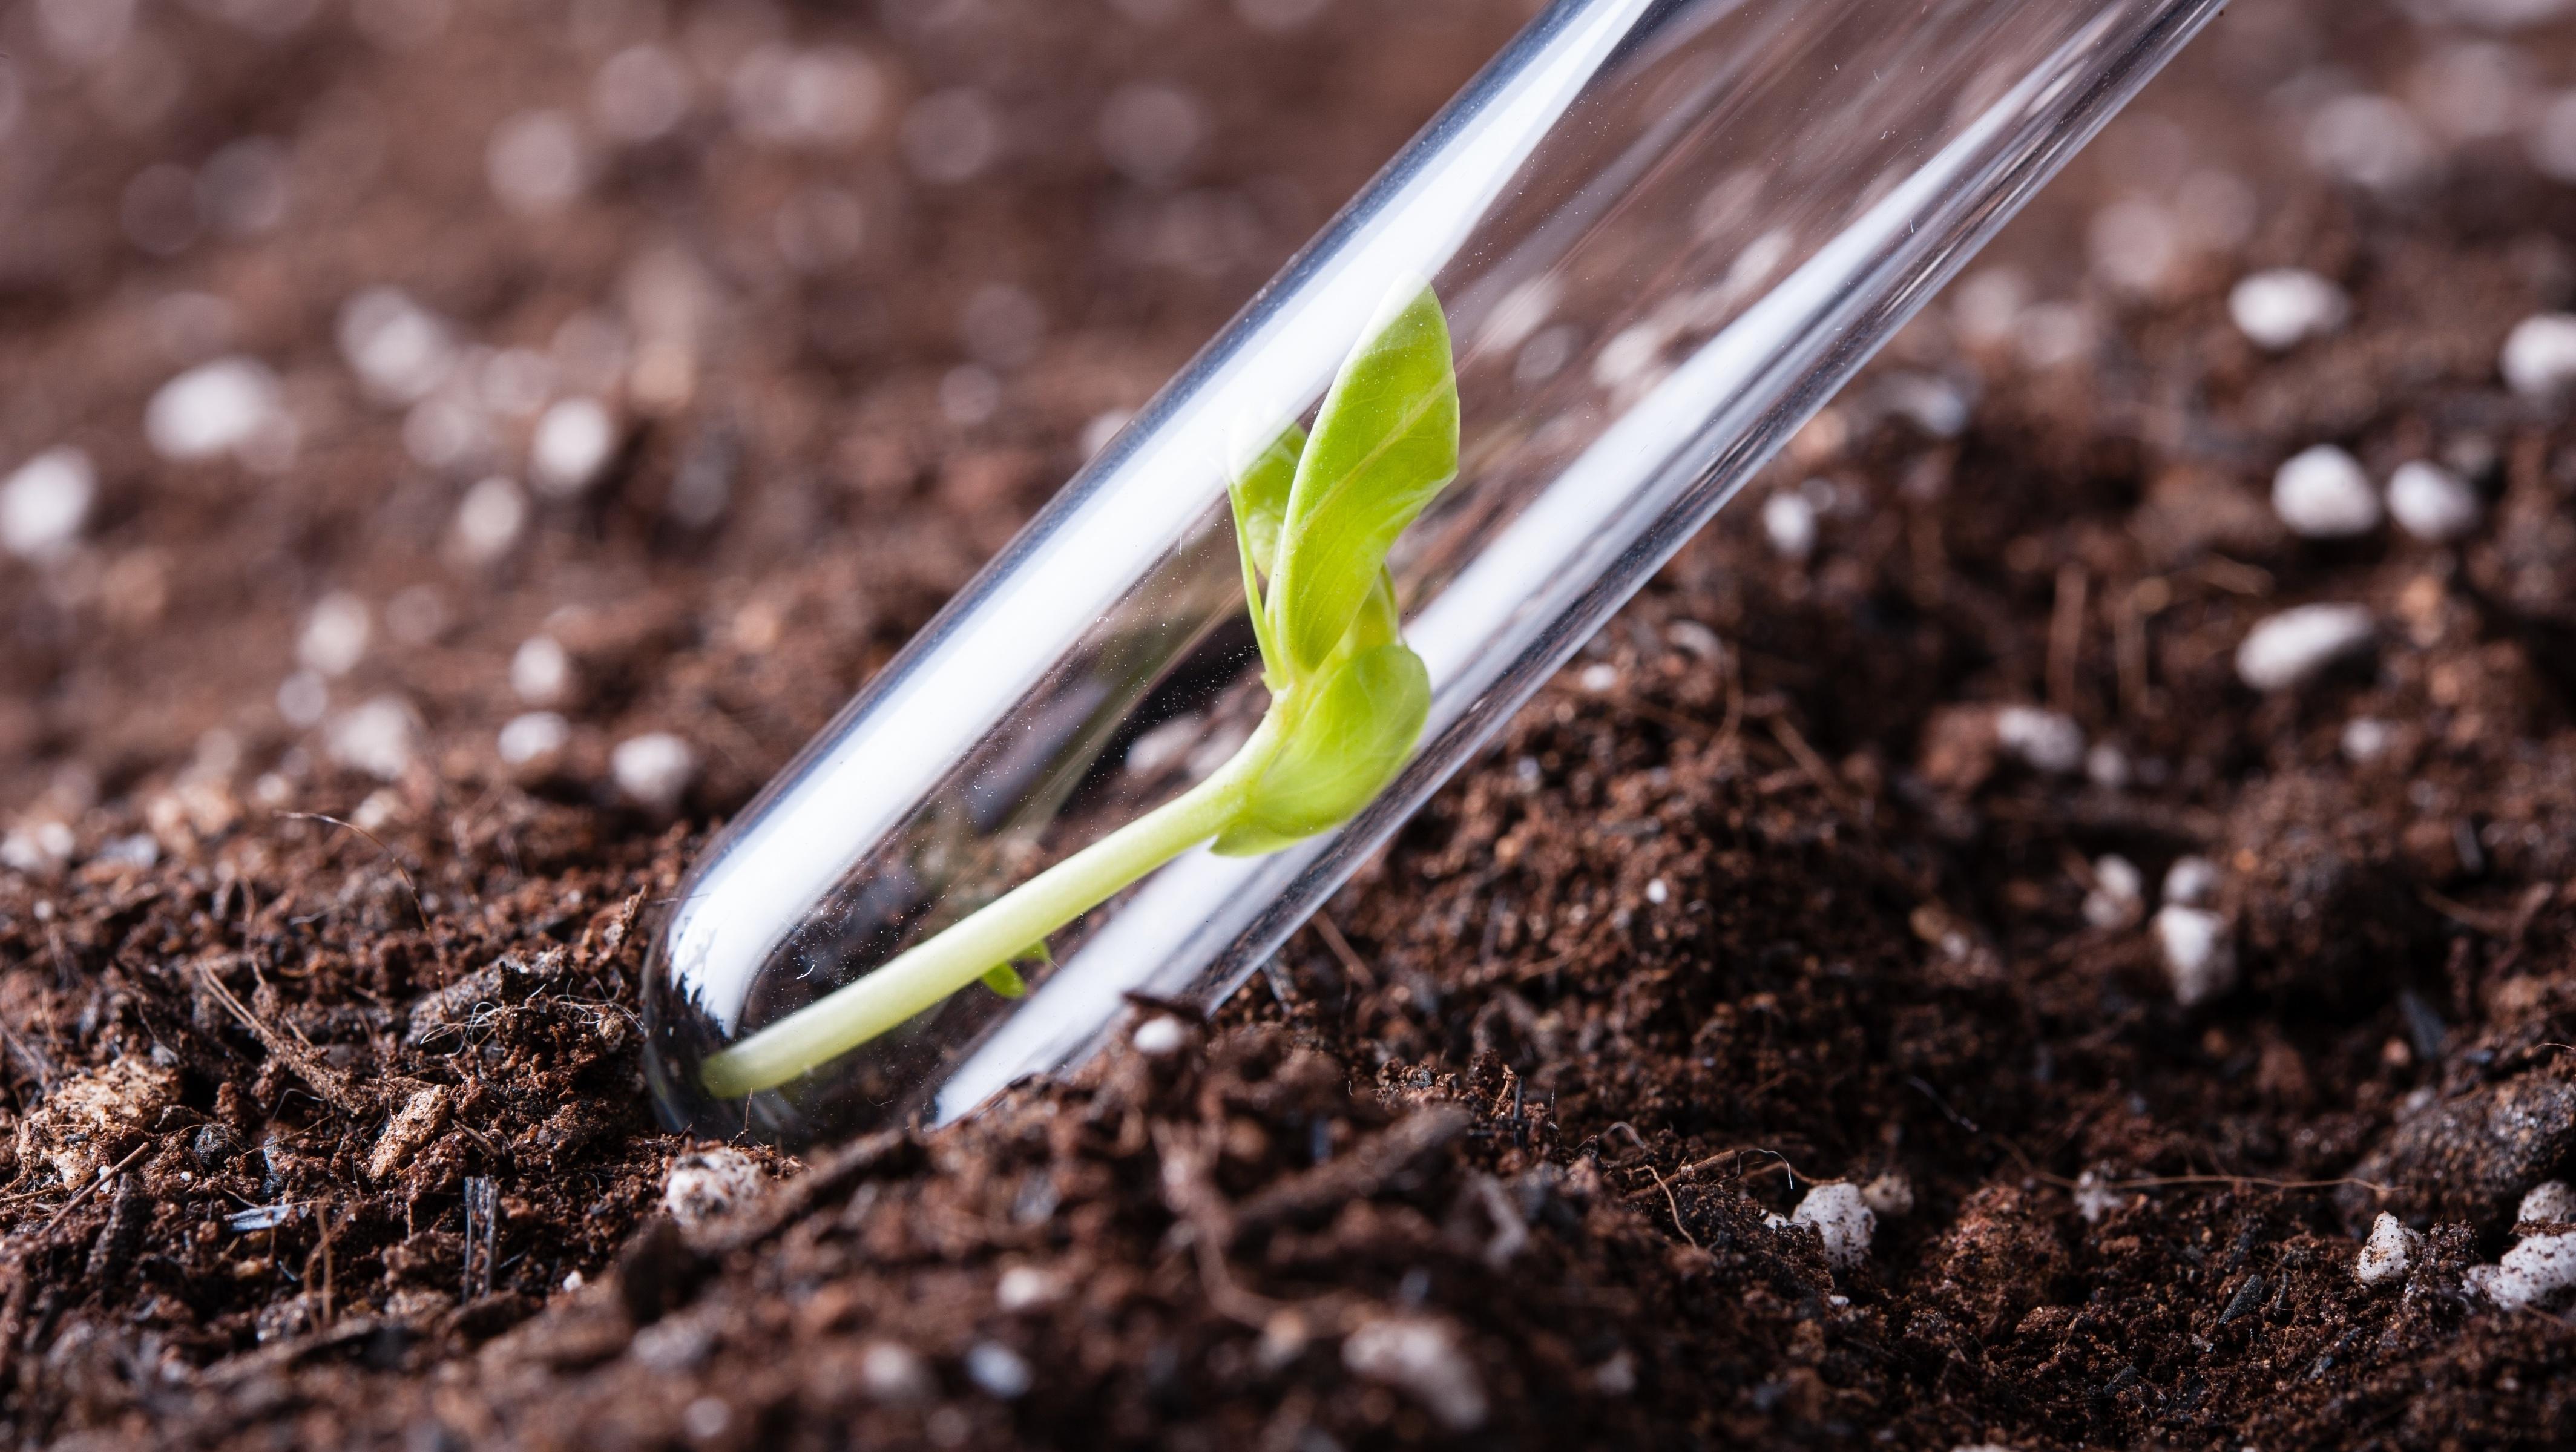 Stock Test Tube + Soil and plant-173483-edited.jpeg